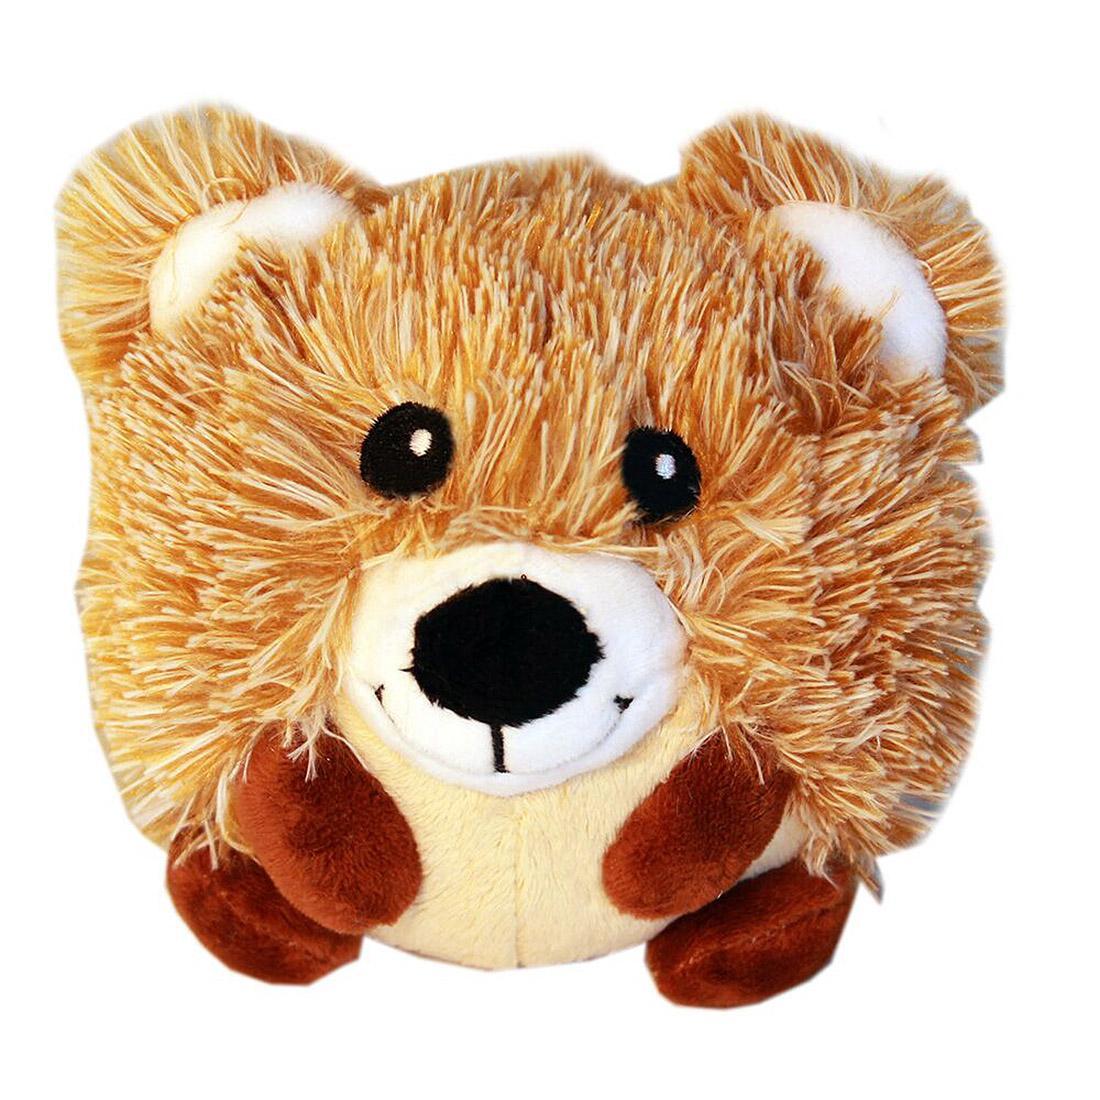 Roundimal Squeaky Dog Toy - Bear